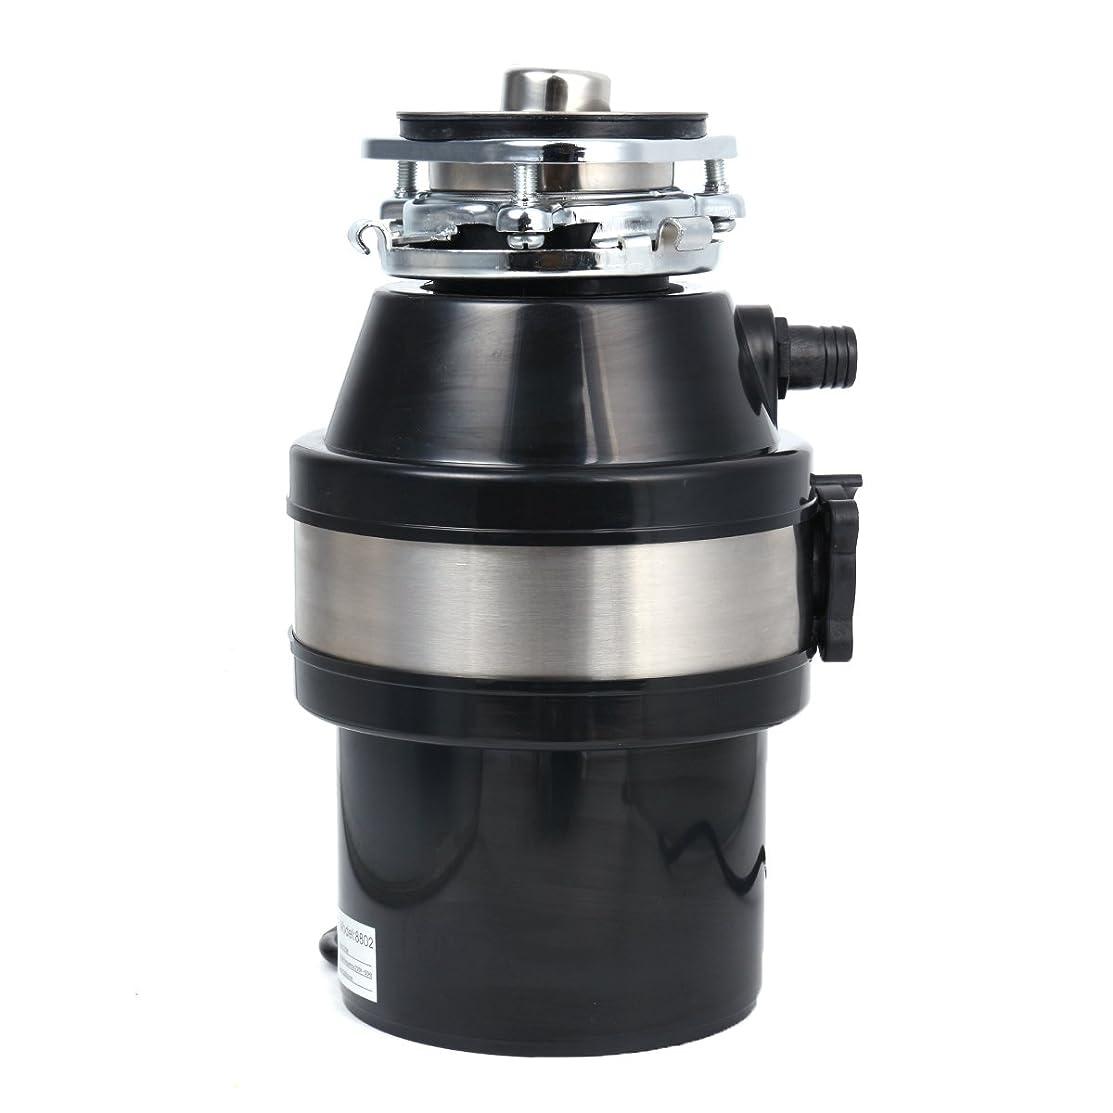 370W 220V Waste Disposer Food Garbage Sink Disposal Garbage Disposal with Power Cord US Plug